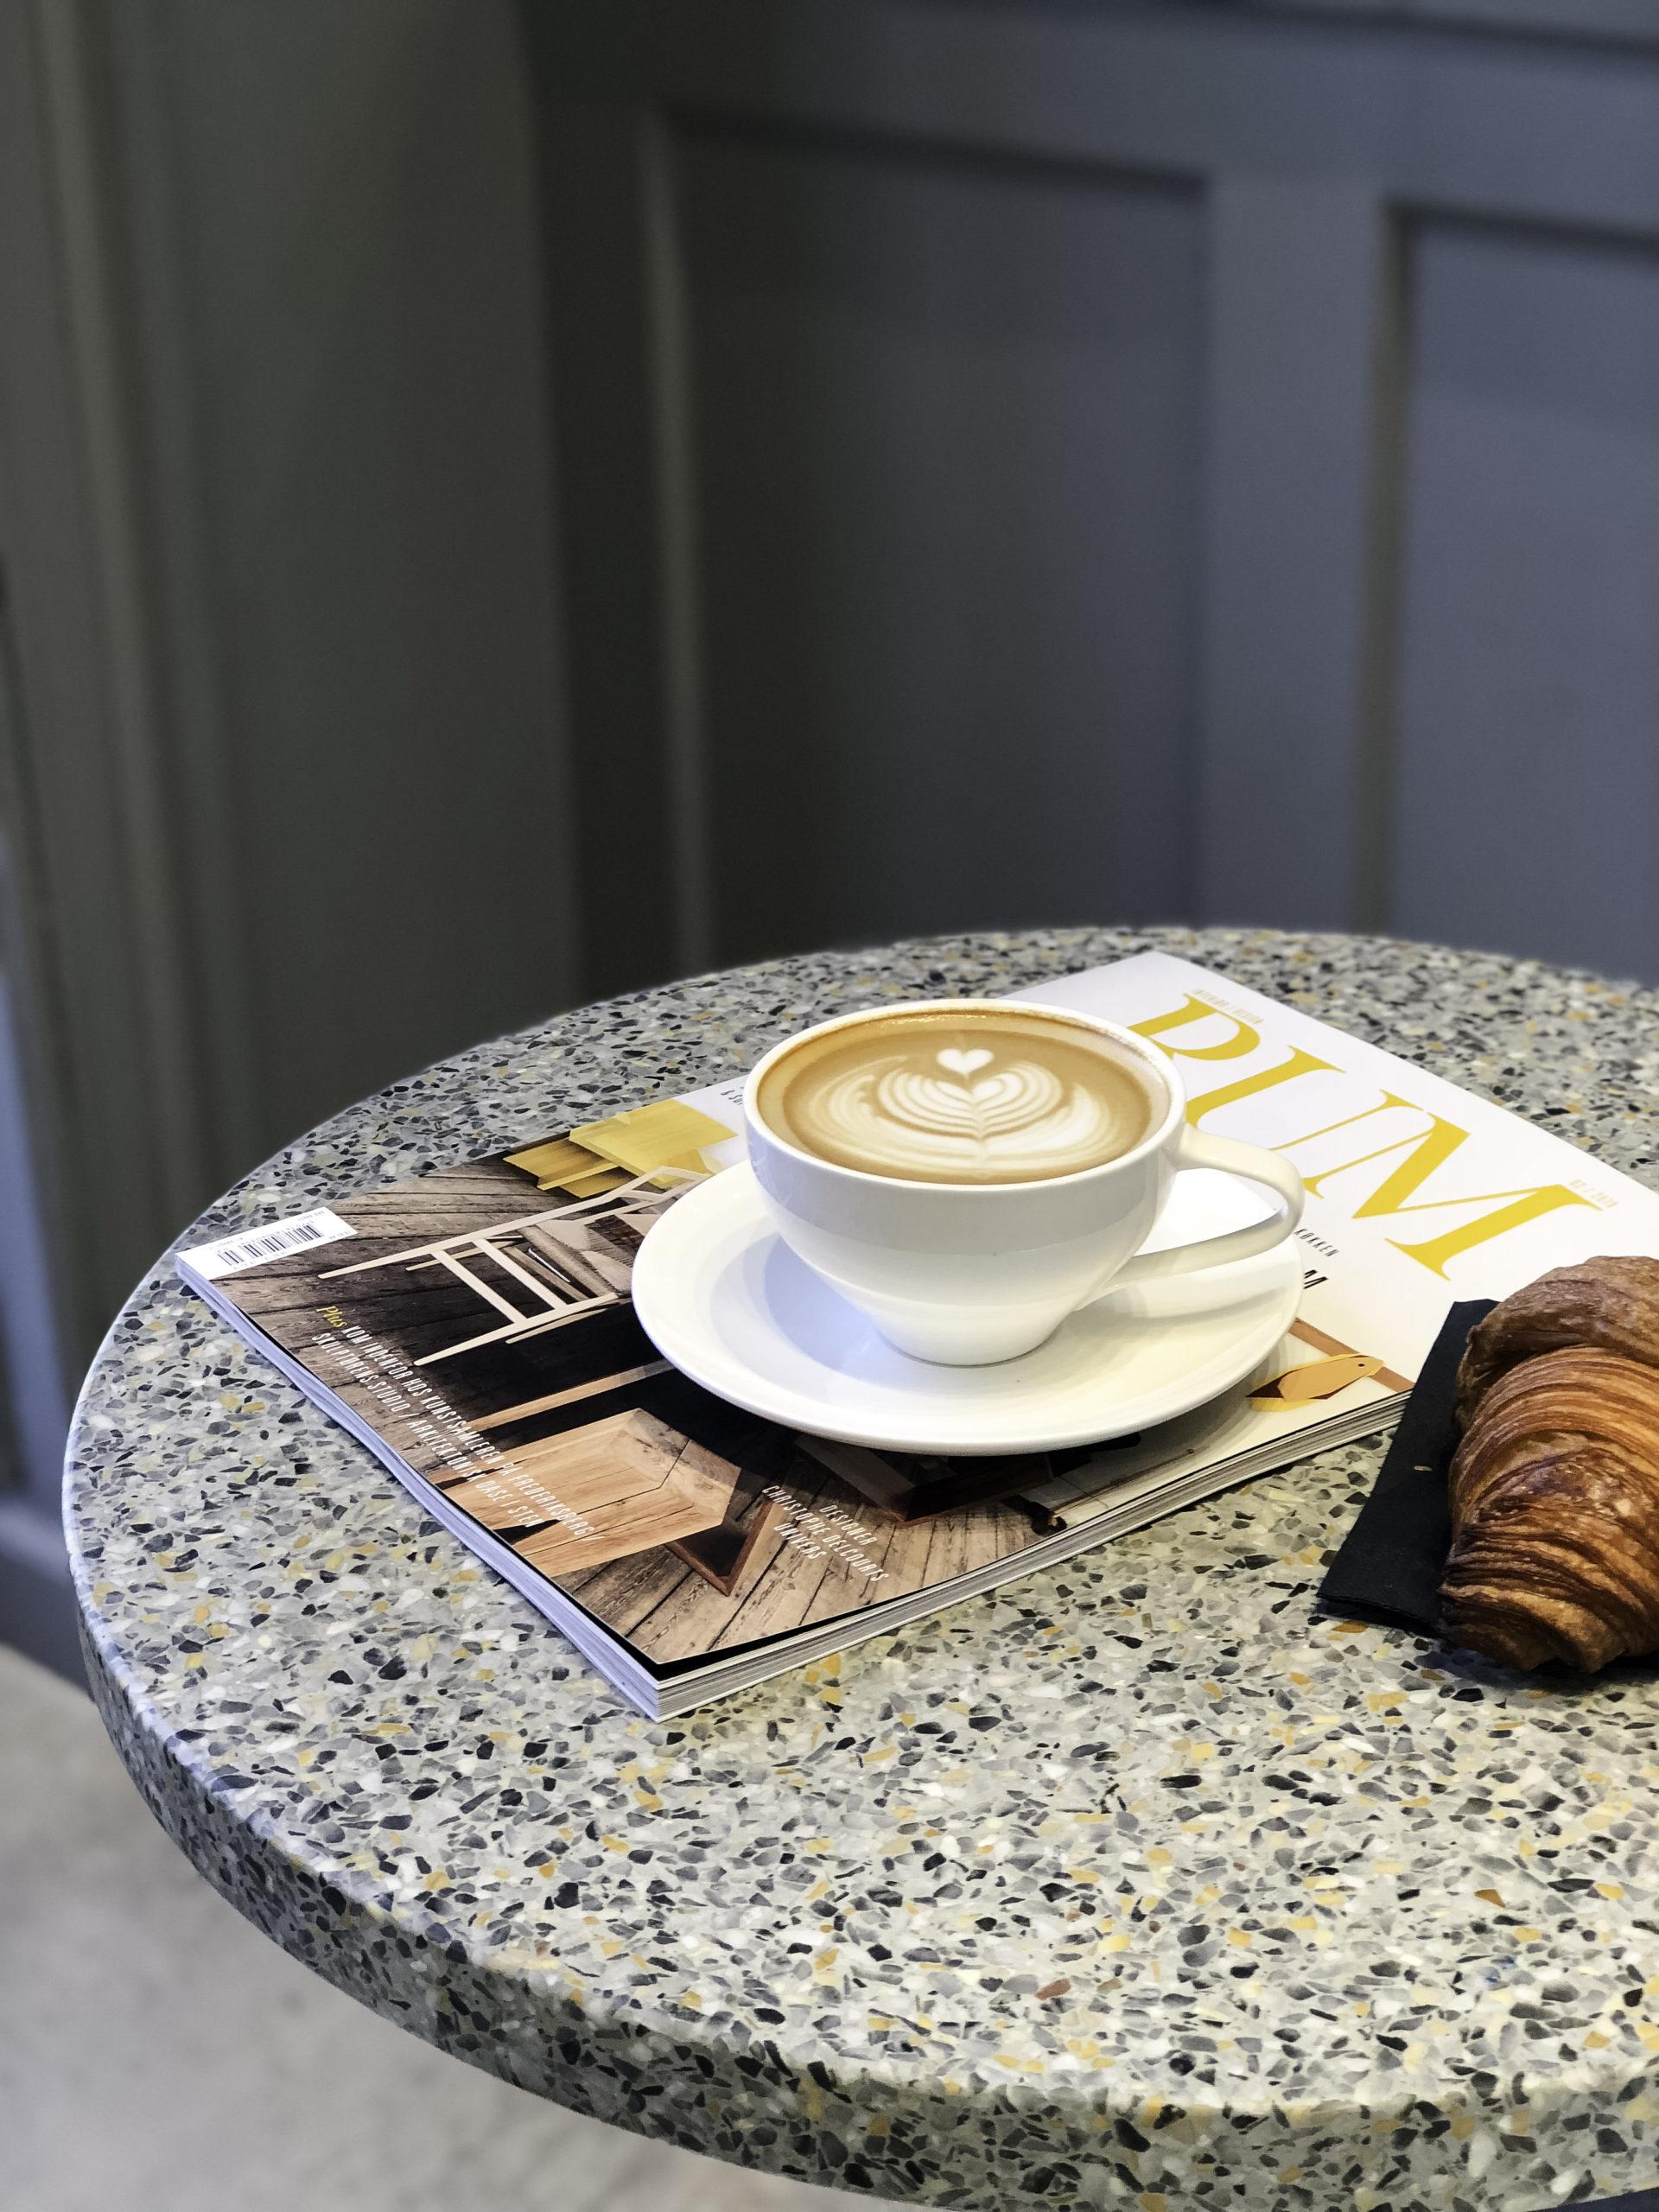 Architectmade-FJ-Essence-Porcelain-Tea-Set-Denmark-Finn-Juhl-12